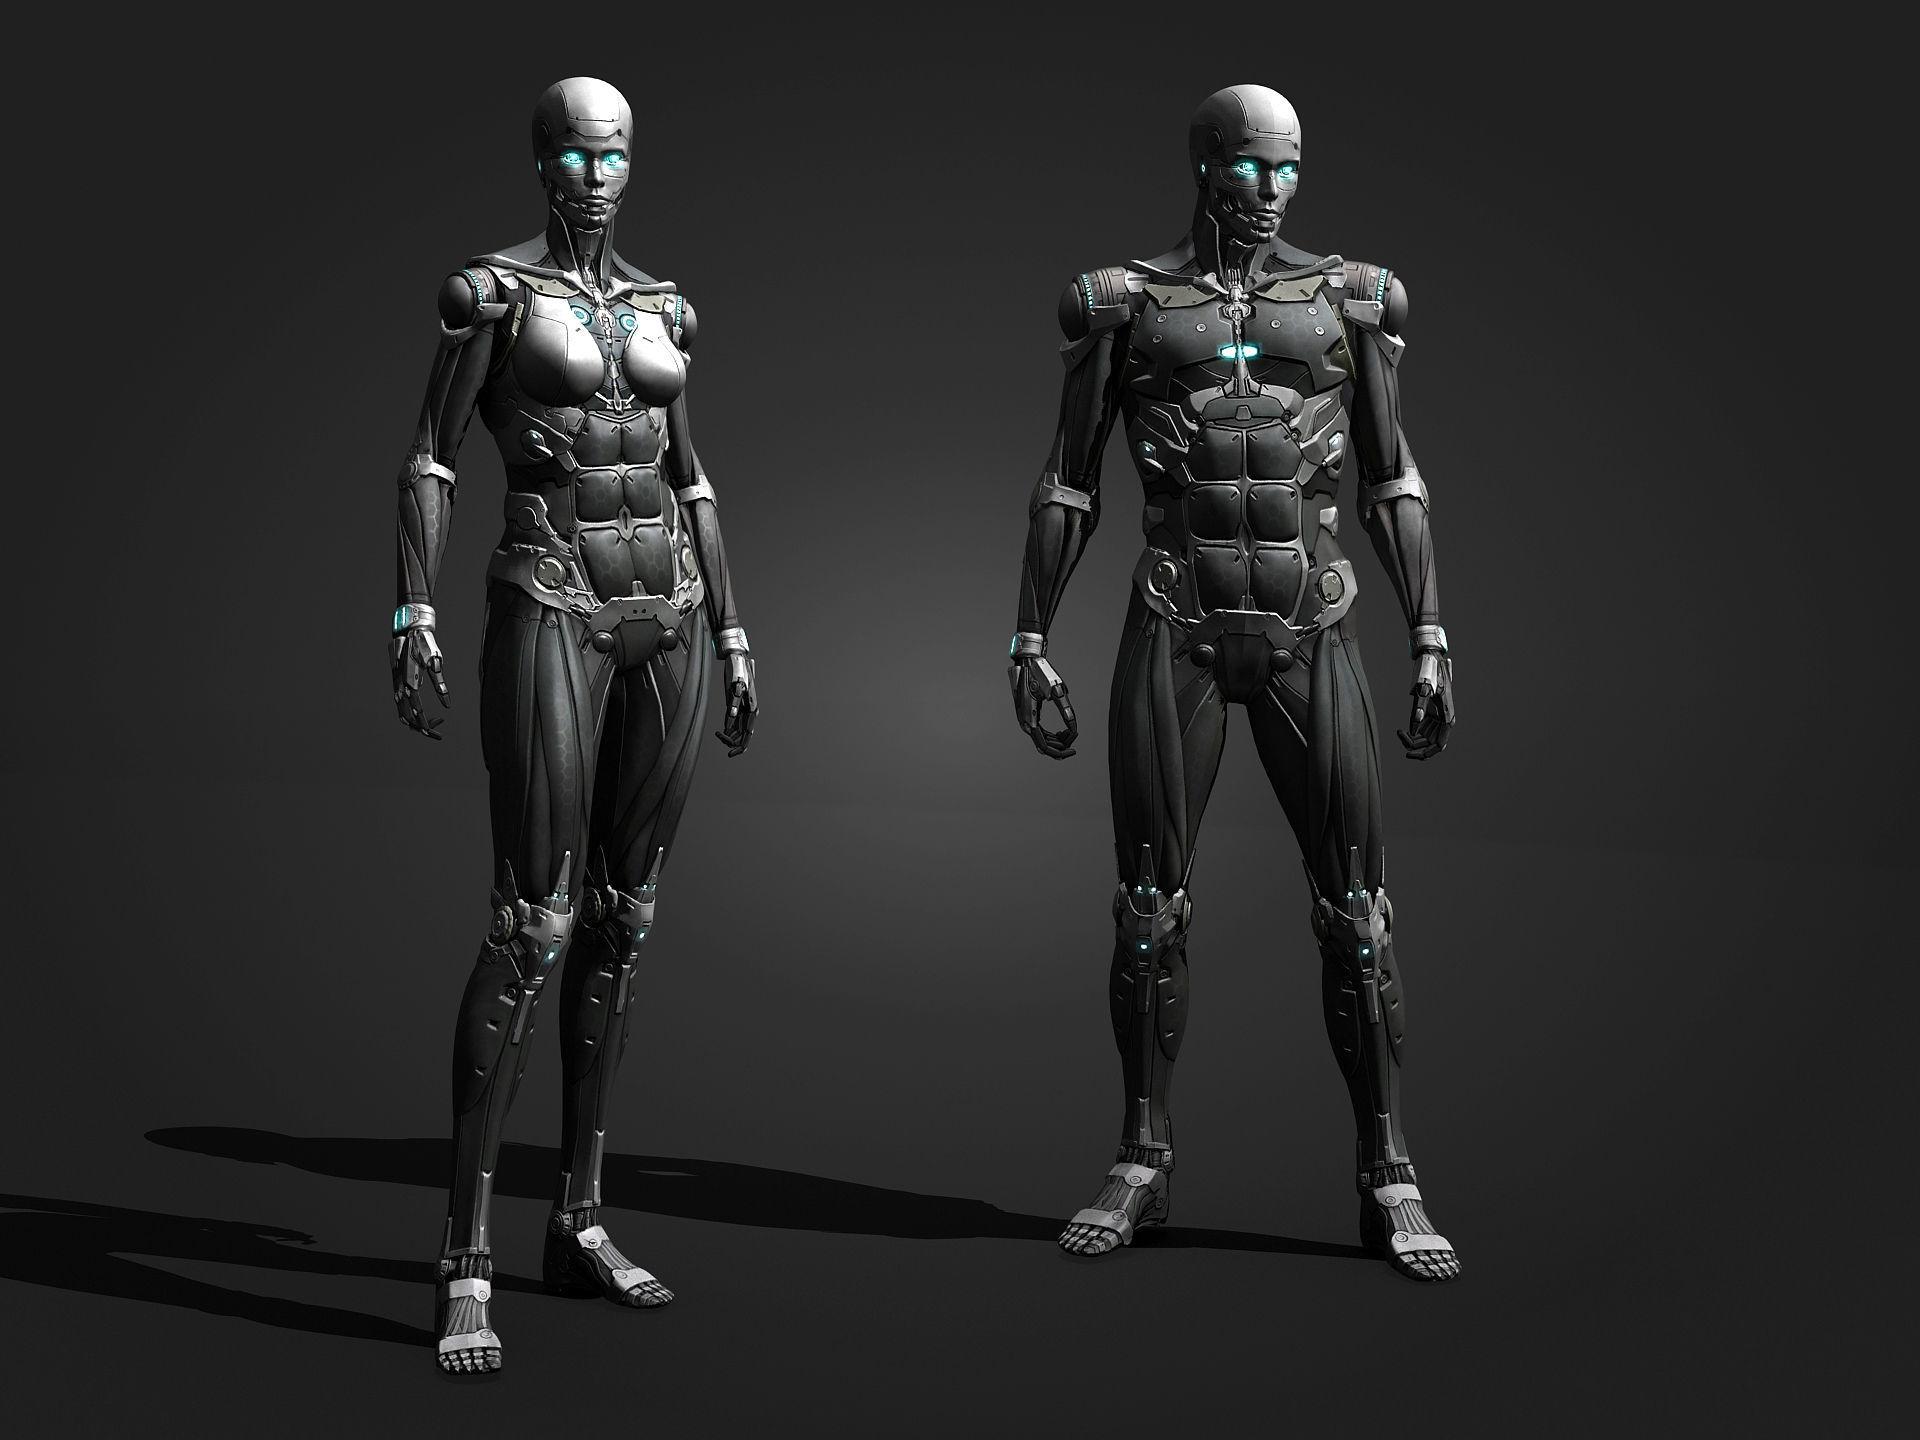 Cyborg Sci-Fi Robot